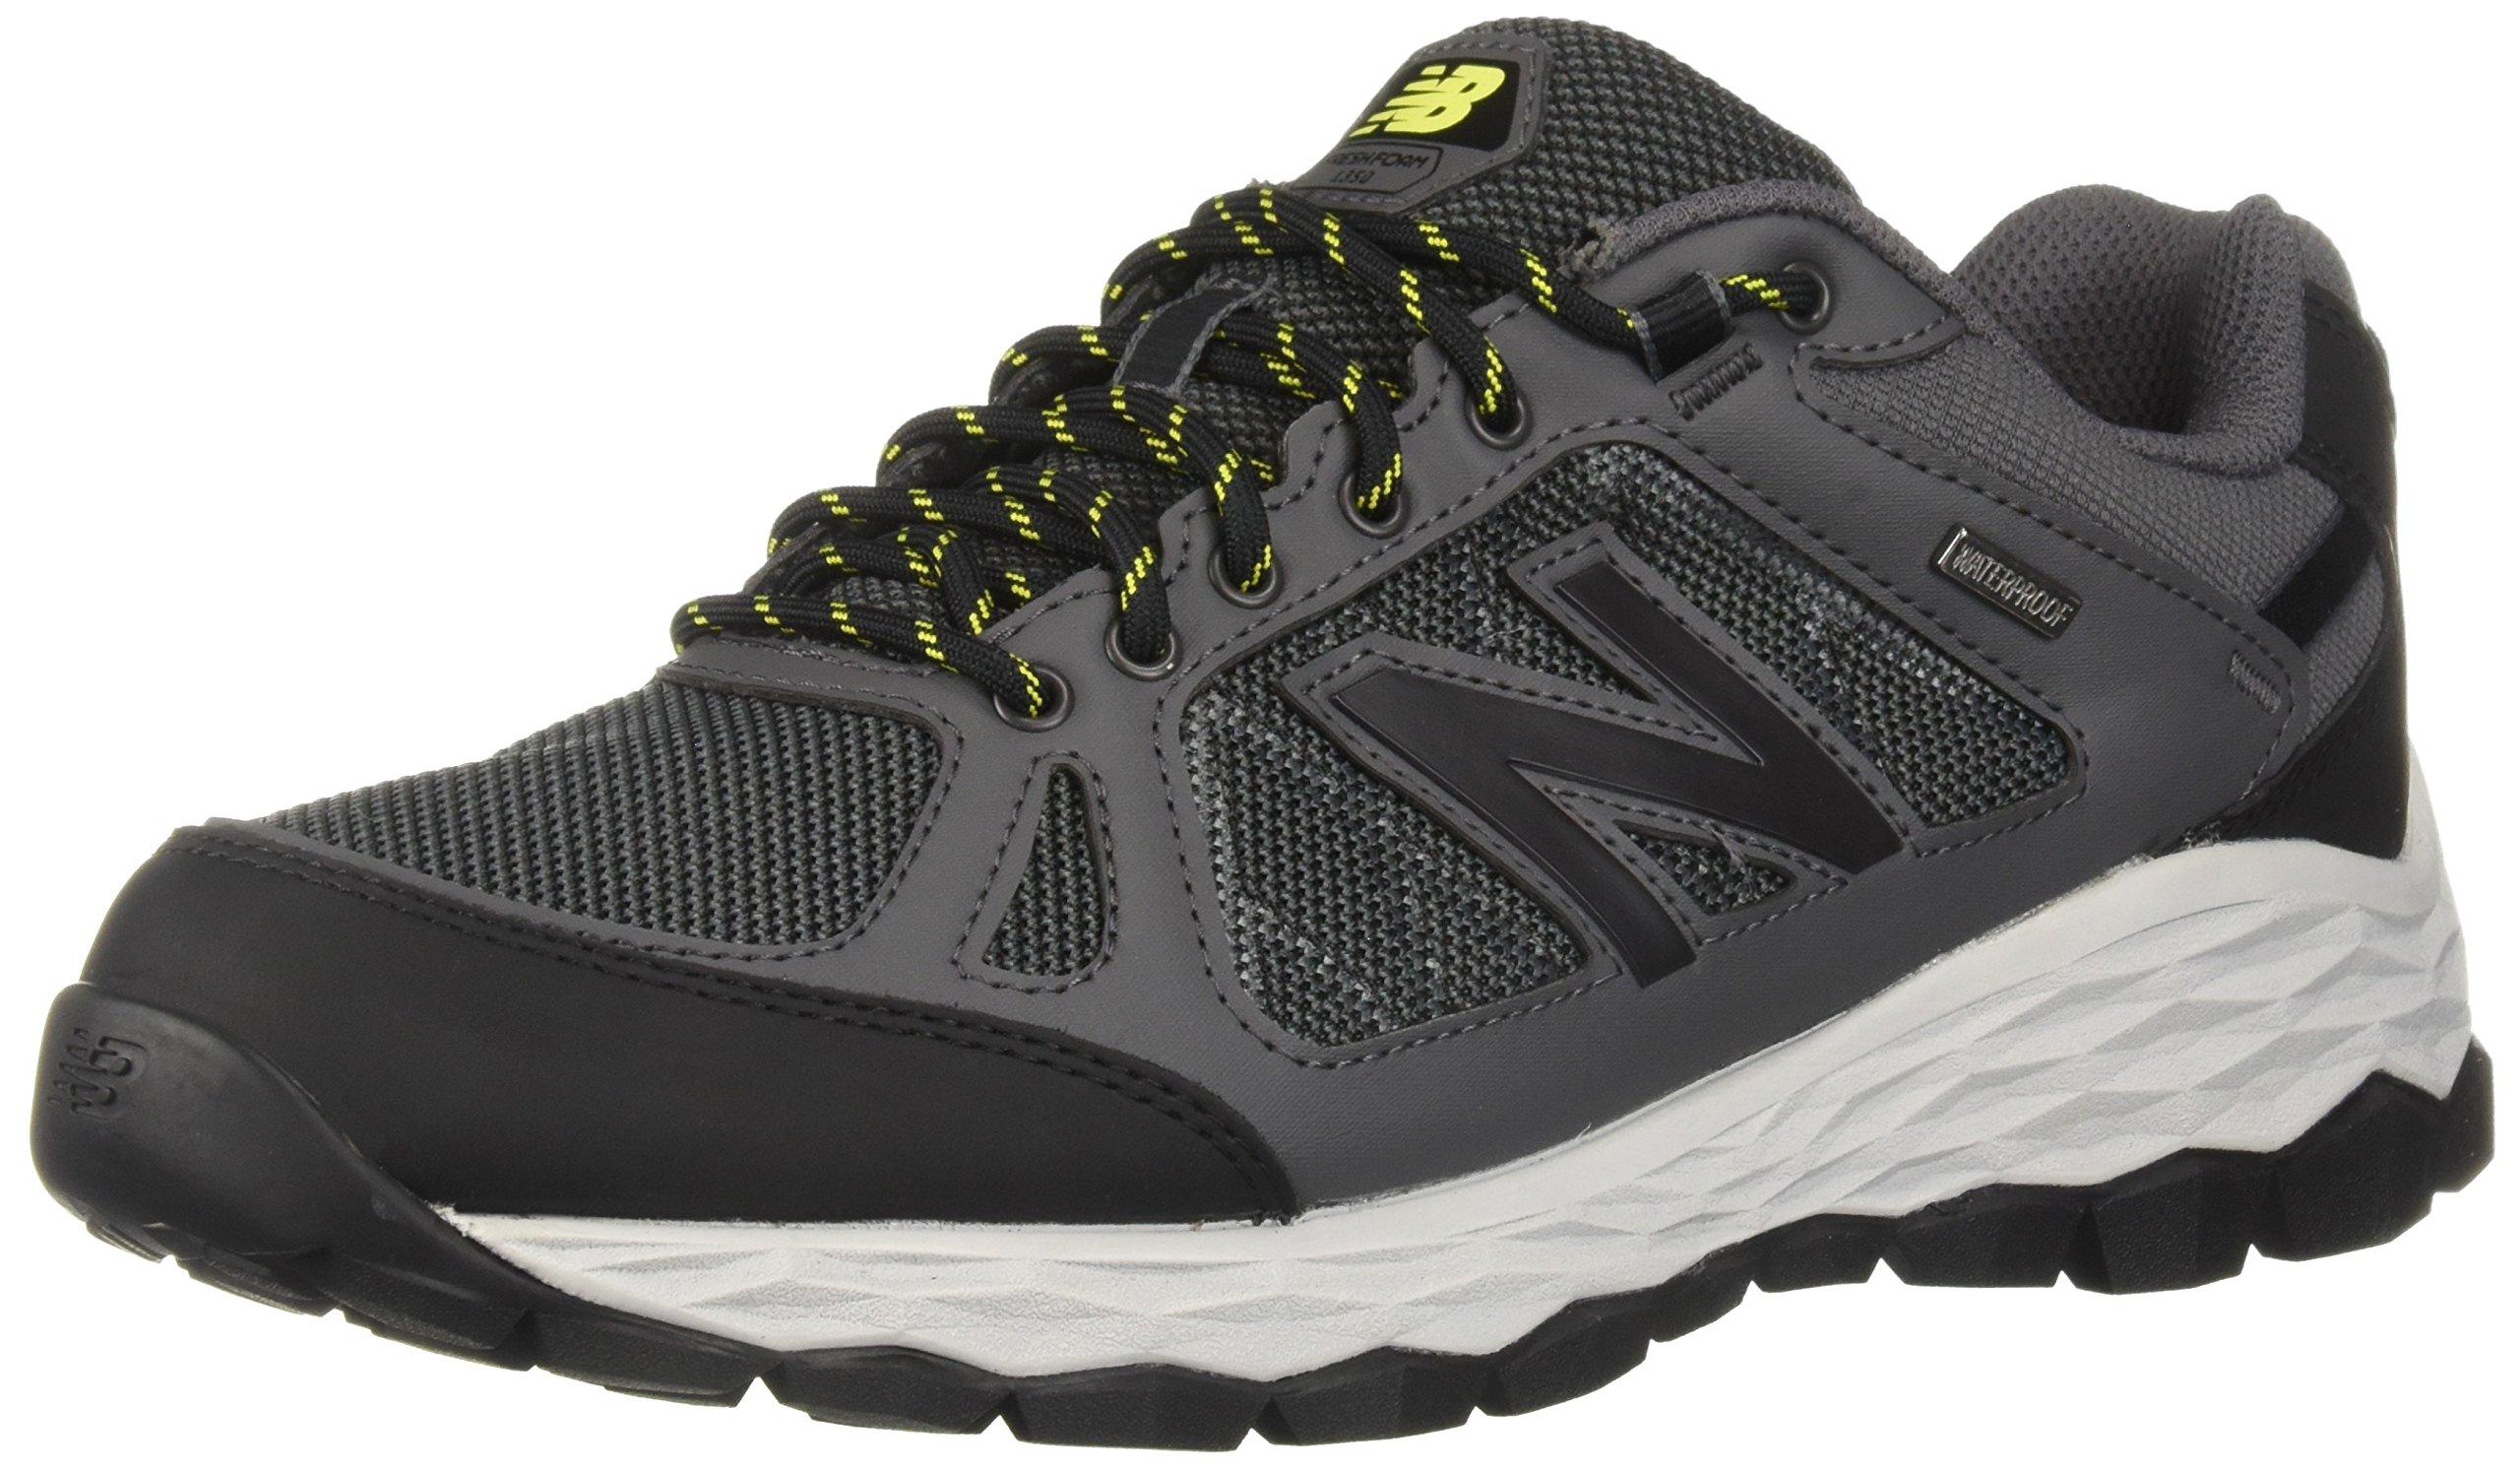 New Balance Men's 13501 Fresh Foam Walking Shoe, Grey, 12 4E US by New Balance